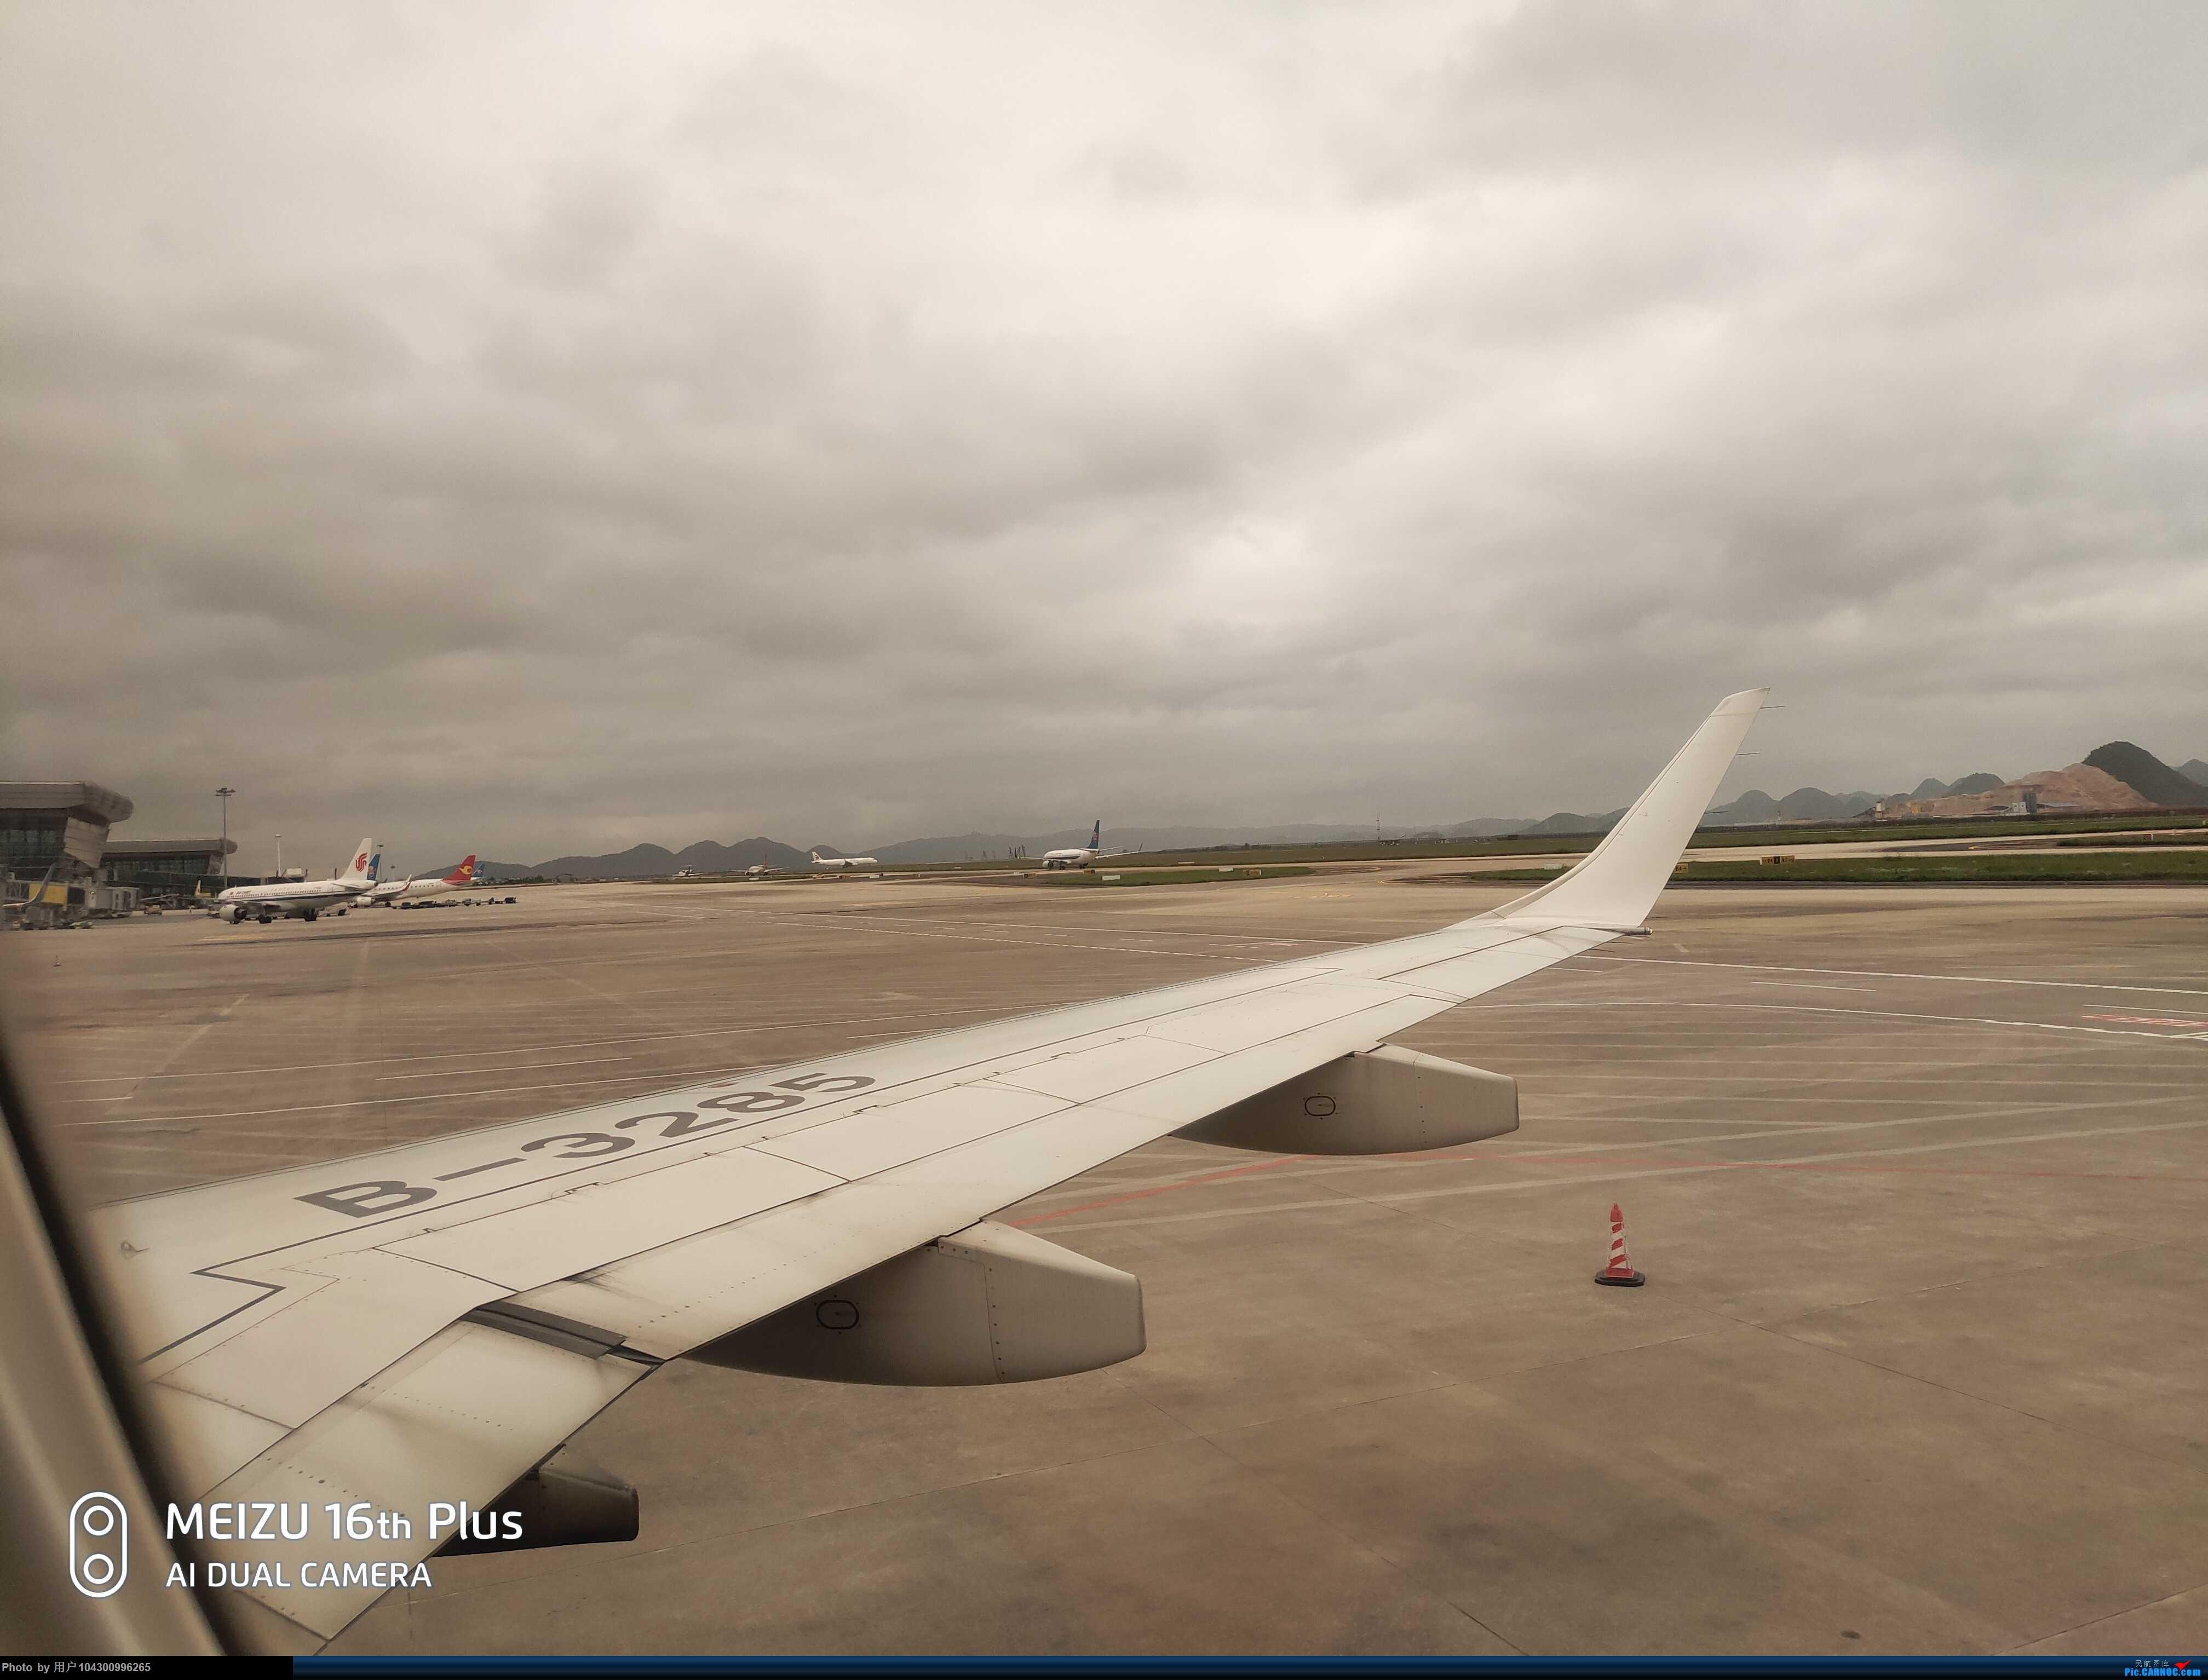 Re:[原创][DM哥飞行游记]-多彩贵州航空贵阳-茅台当日往返 EMBRAER E-190 B-3285 中国贵阳龙洞堡国际机场